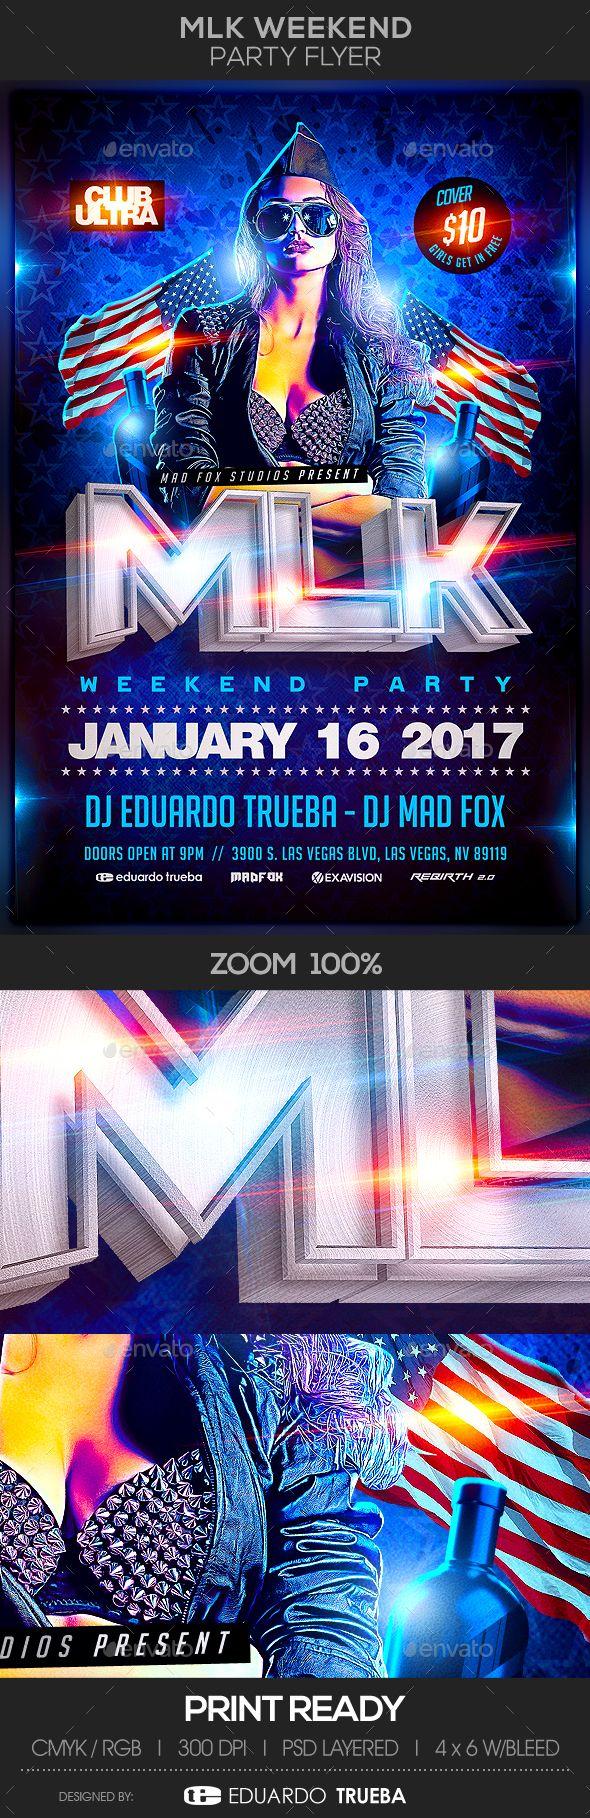 MLK Weekend Party Flyer Template PSD